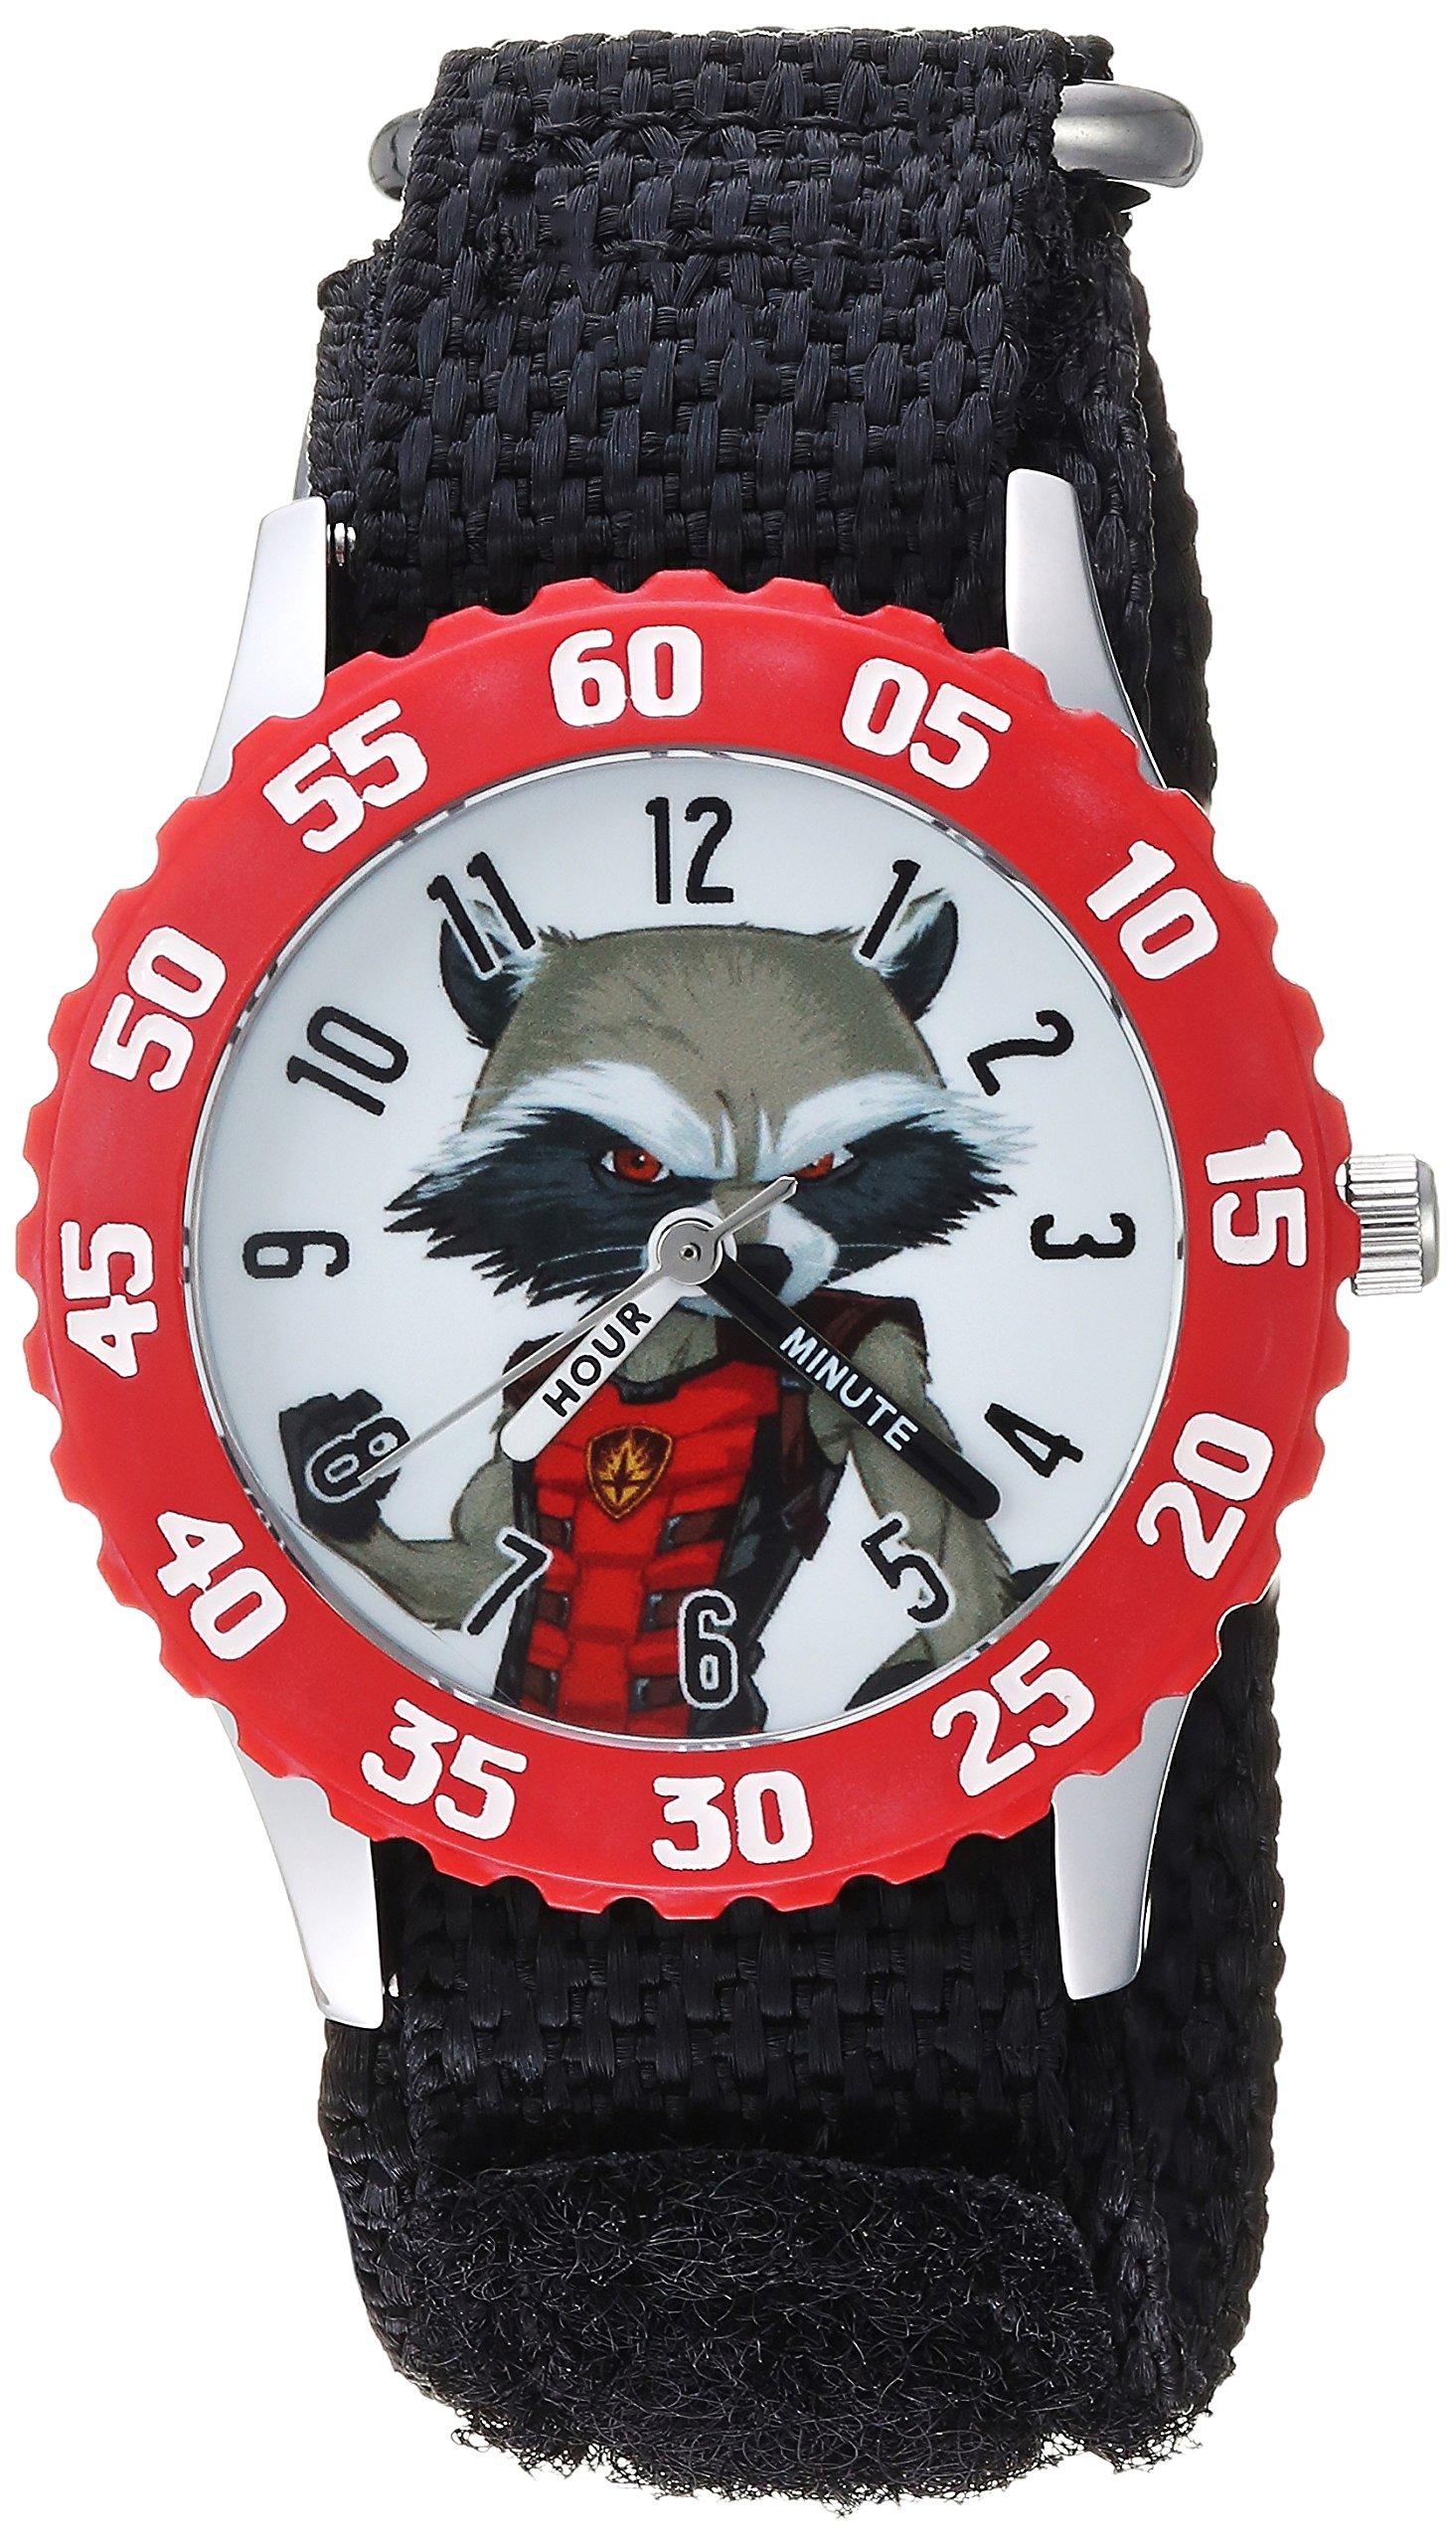 MARVEL Boys Guardian Stainless Steel Analog-Quartz Watch with Nylon Strap, Black, 16 (Model: WMA000135)